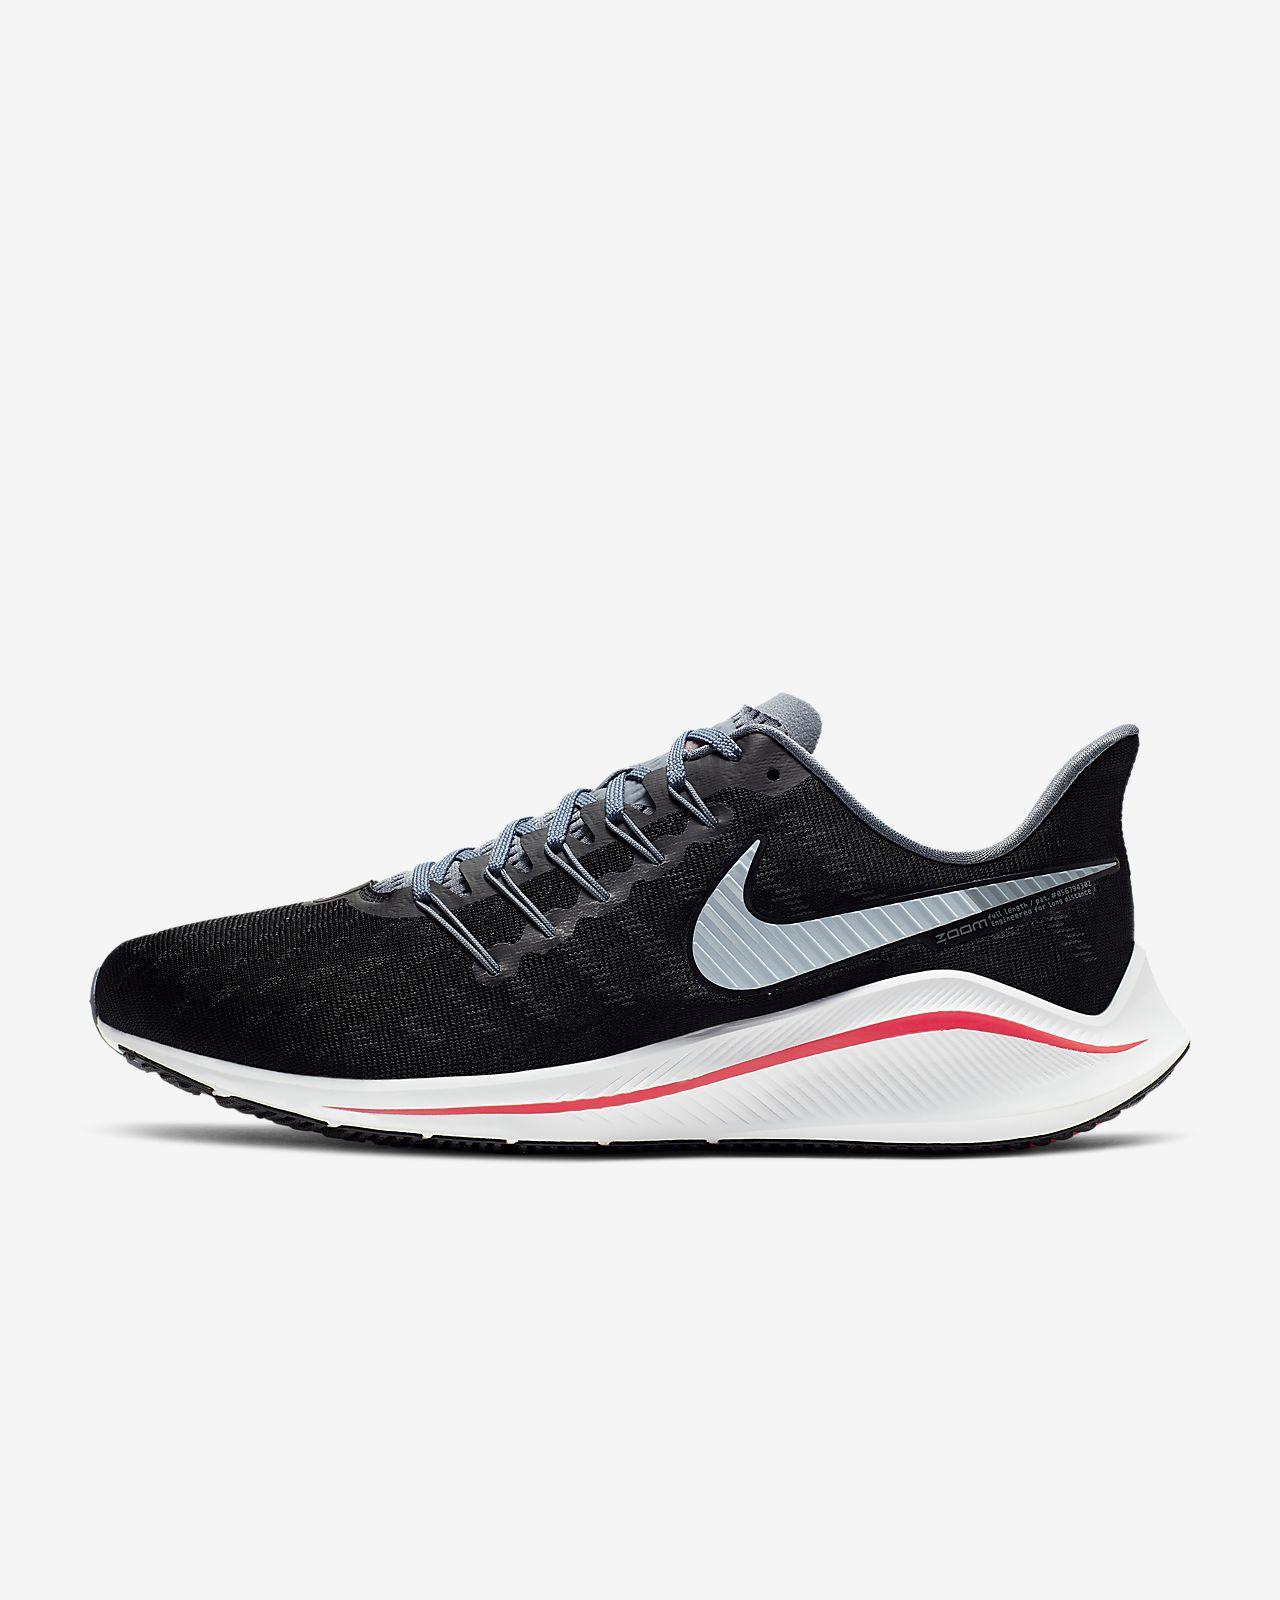 Scarpa da running Nike Air Zoom Vomero 14 - Uomo